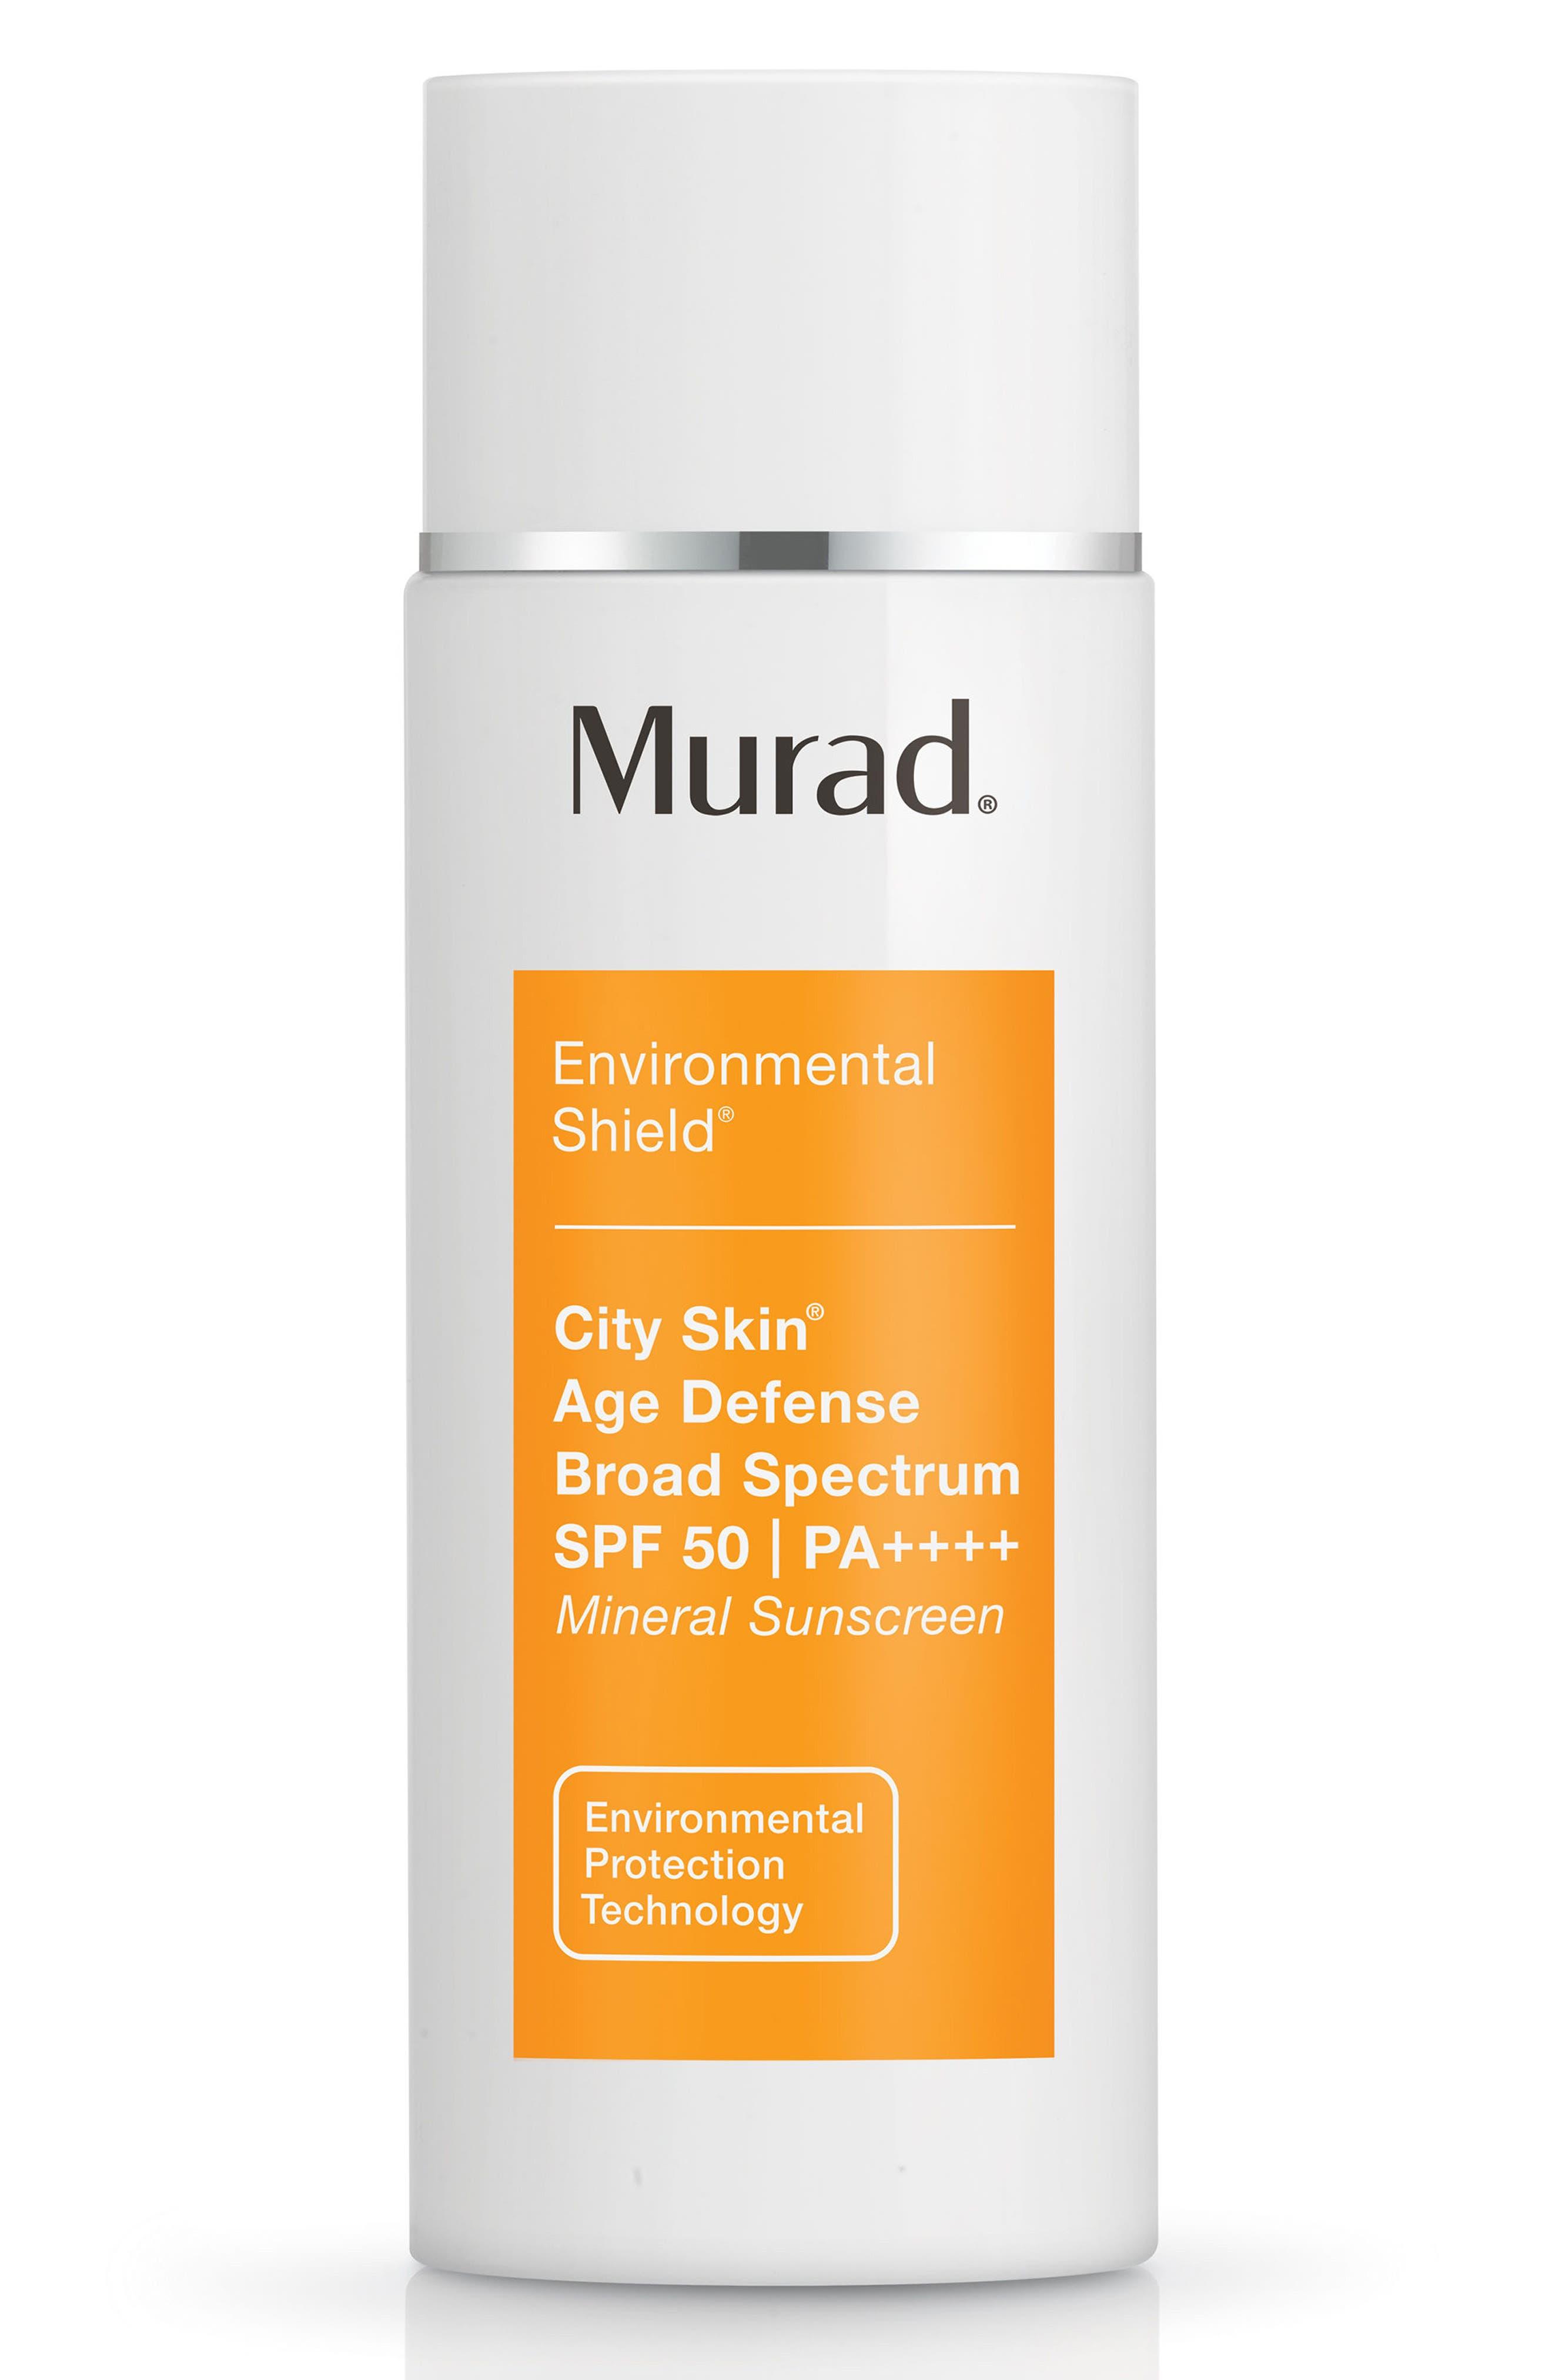 Murad® City Skin Age Defense Broad Spectrum SPF 50 PA++++